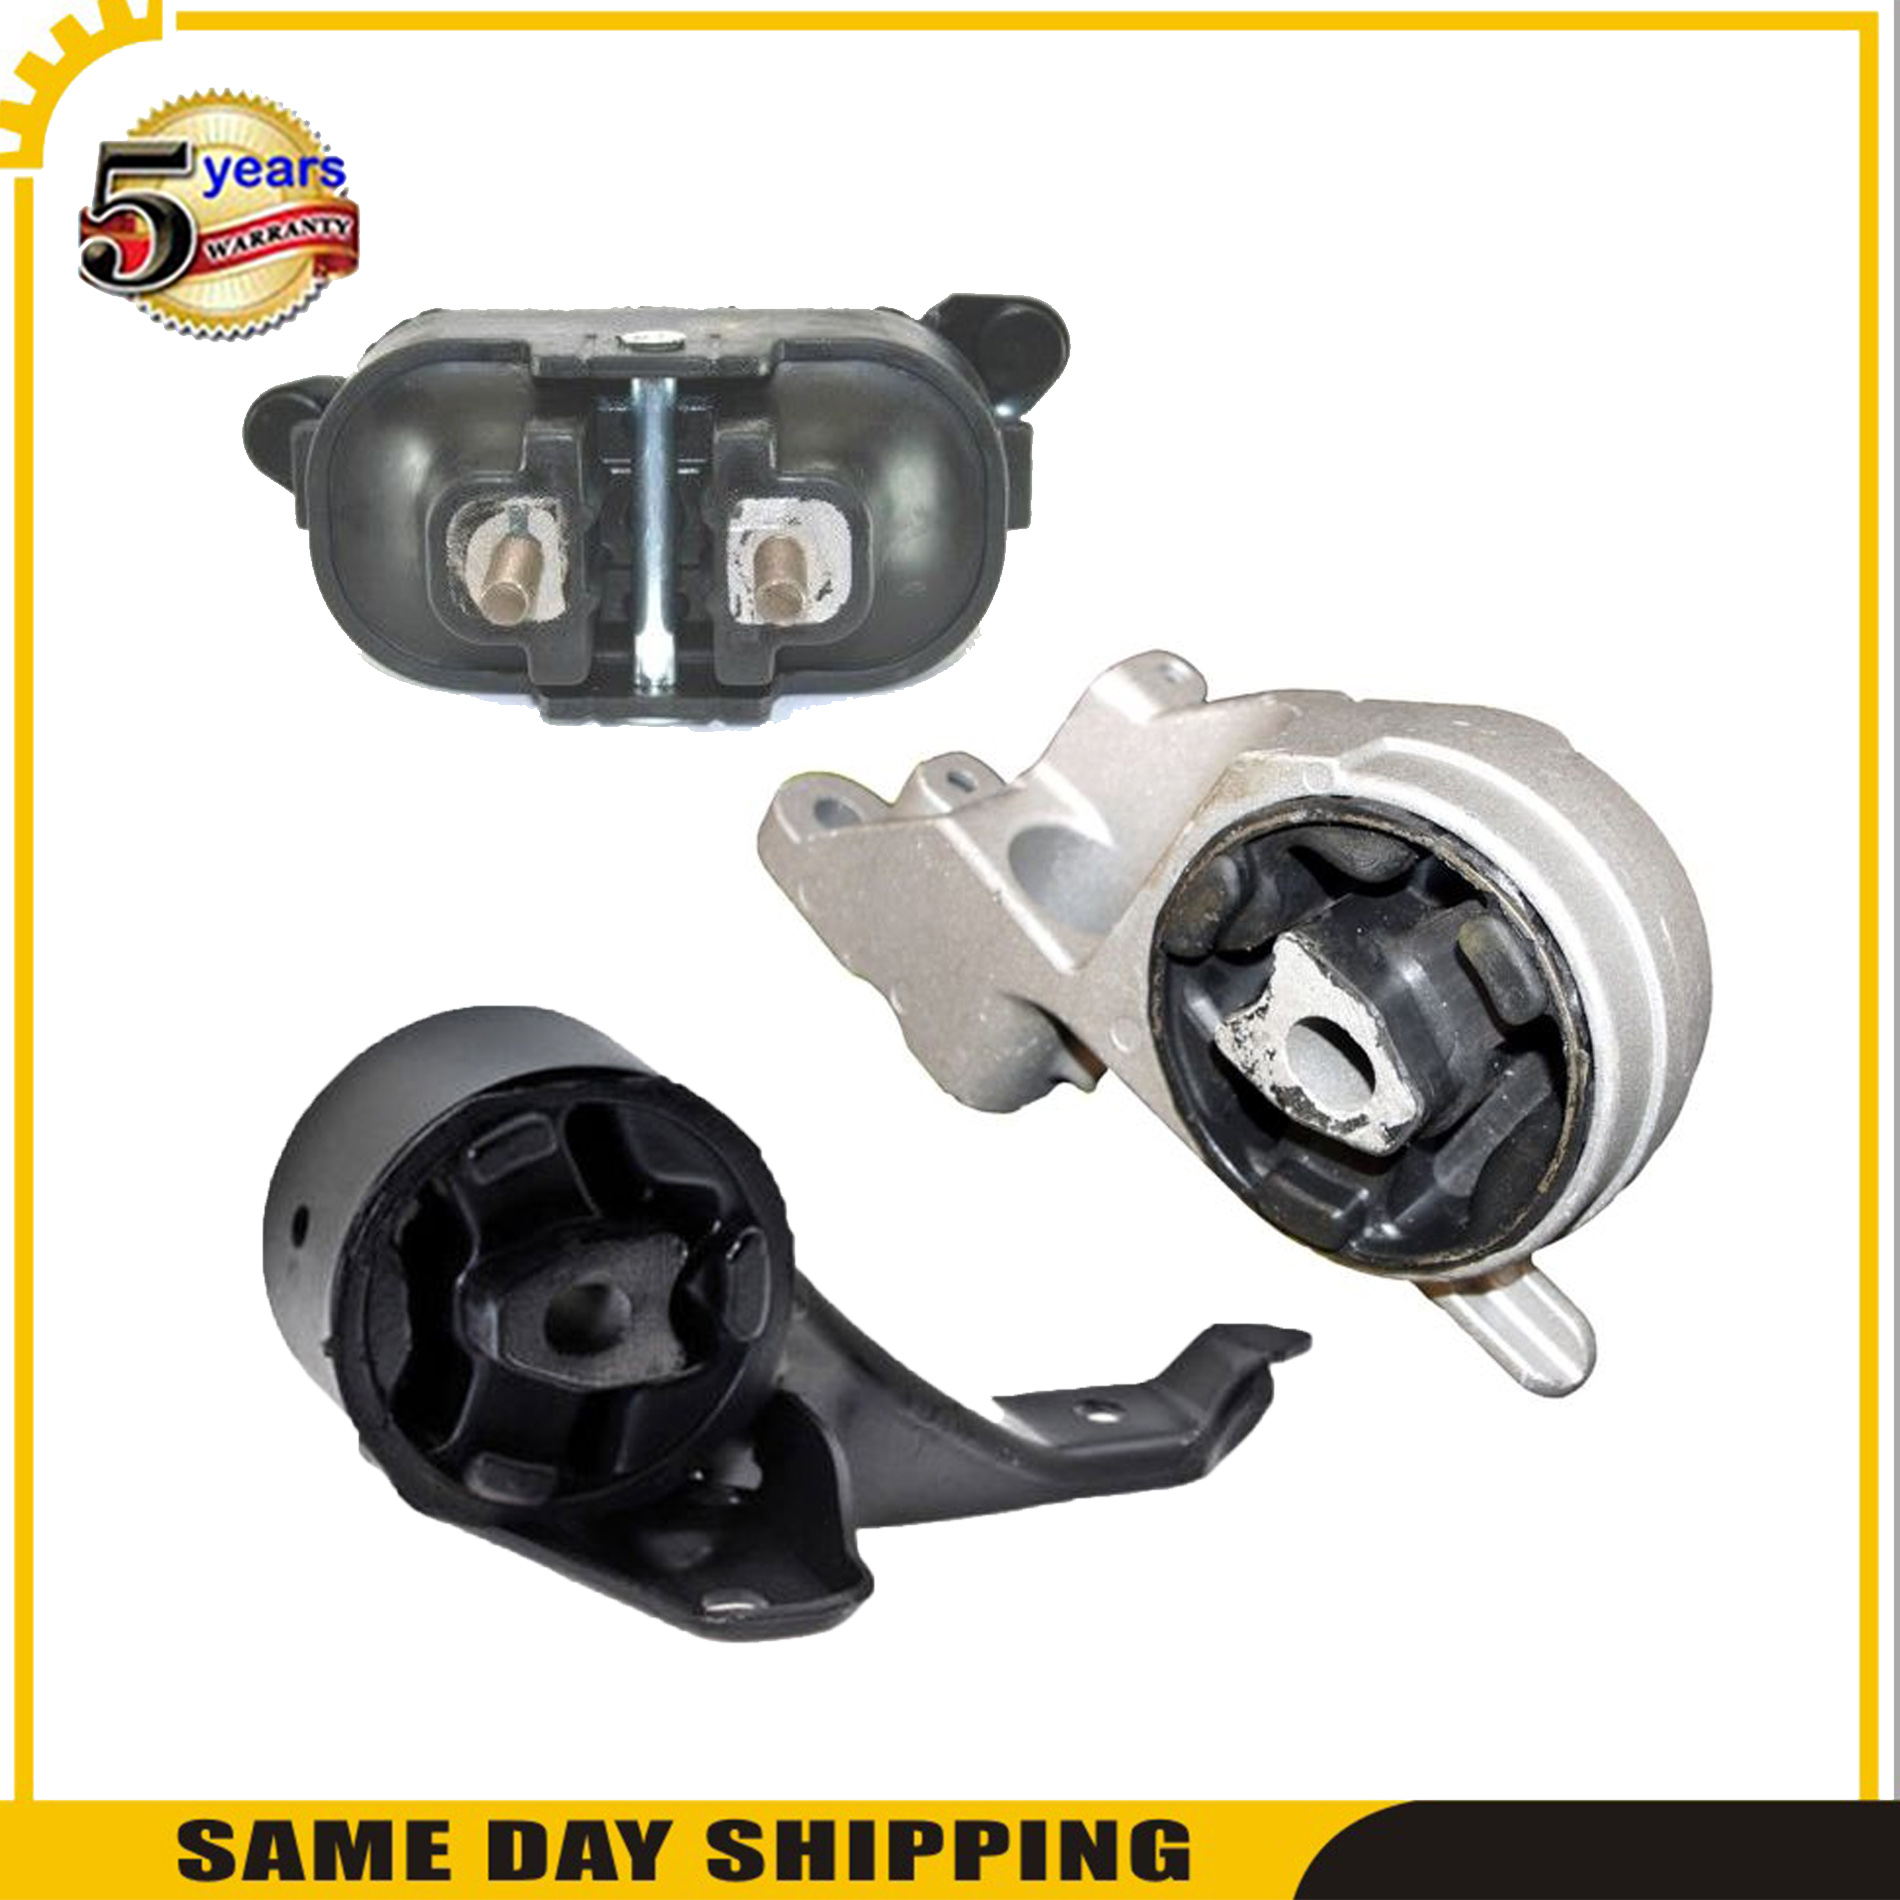 For Pontiac G6 3.5L 05-06 New 5354 5357 5355 Engine Motor /& Trans Mount Set 3pcs